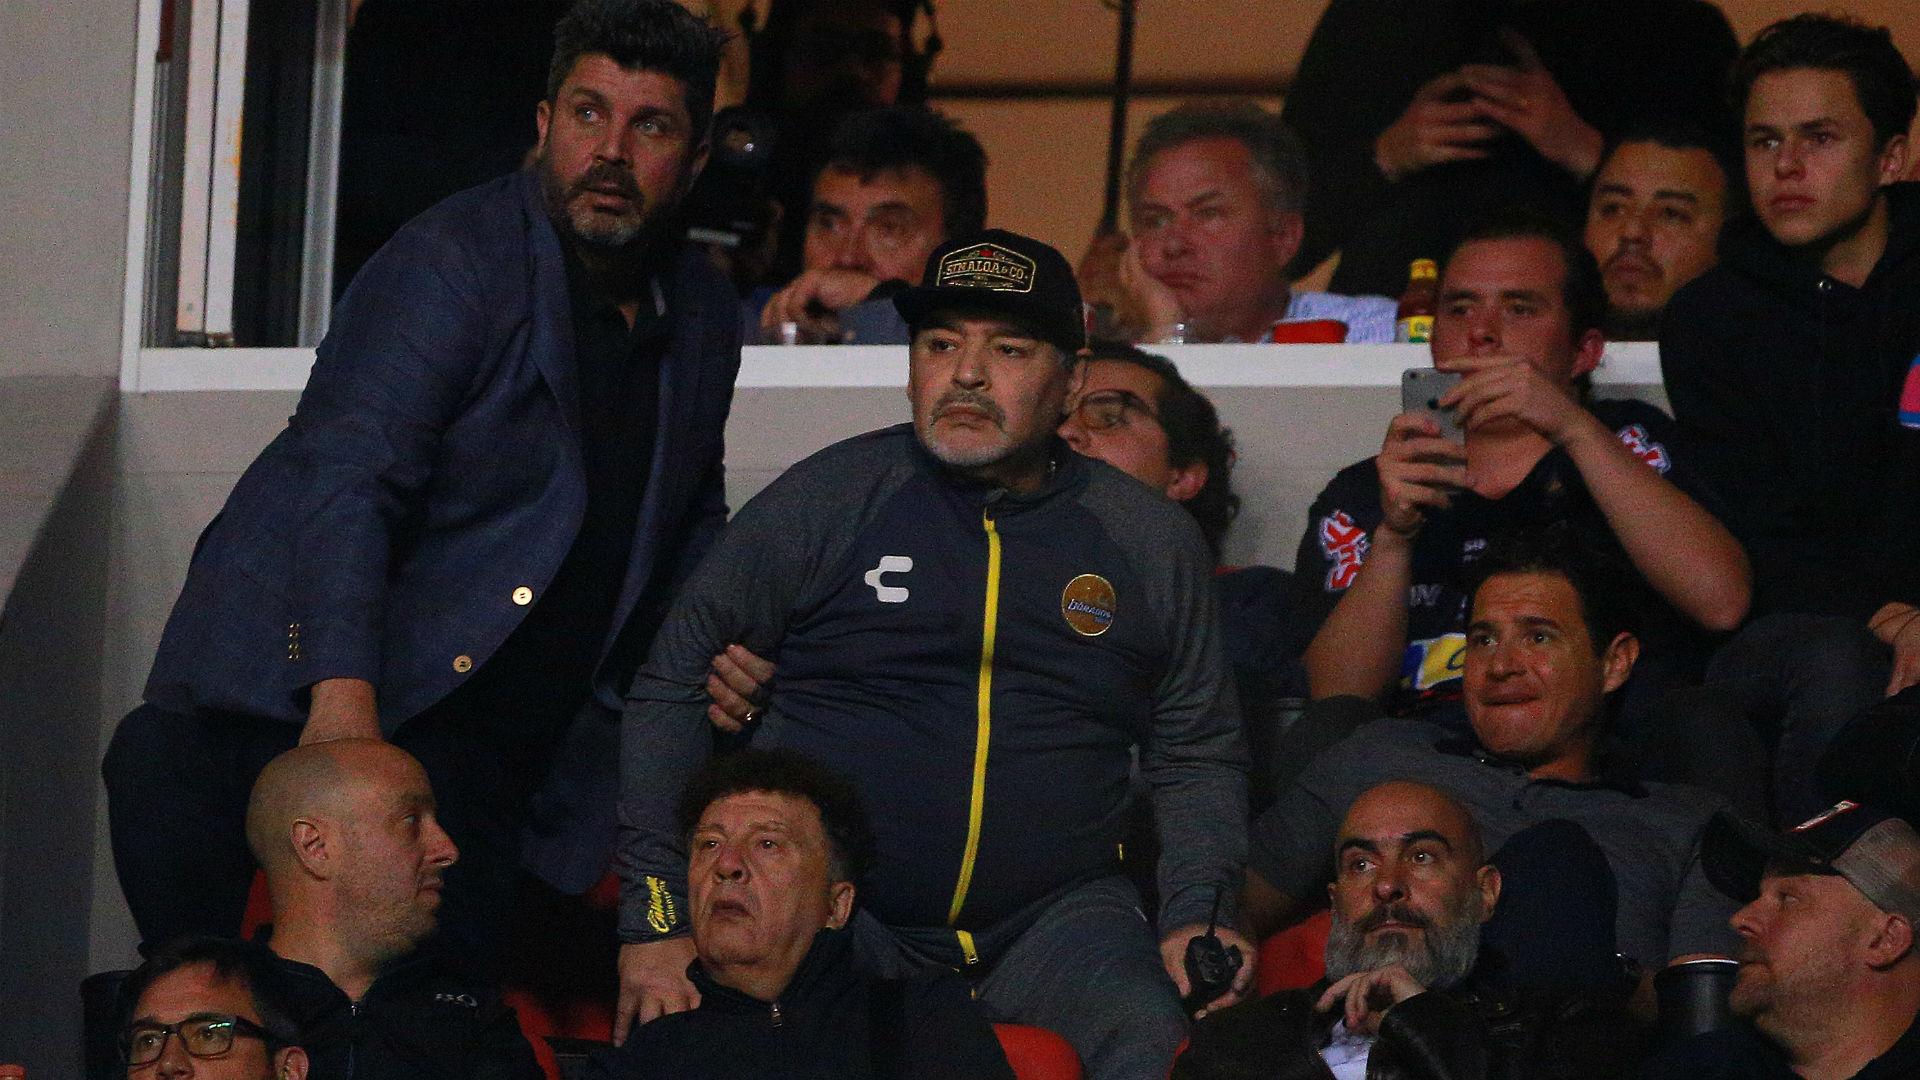 Maradona involved in fracas after Dorados' promotion hopes end